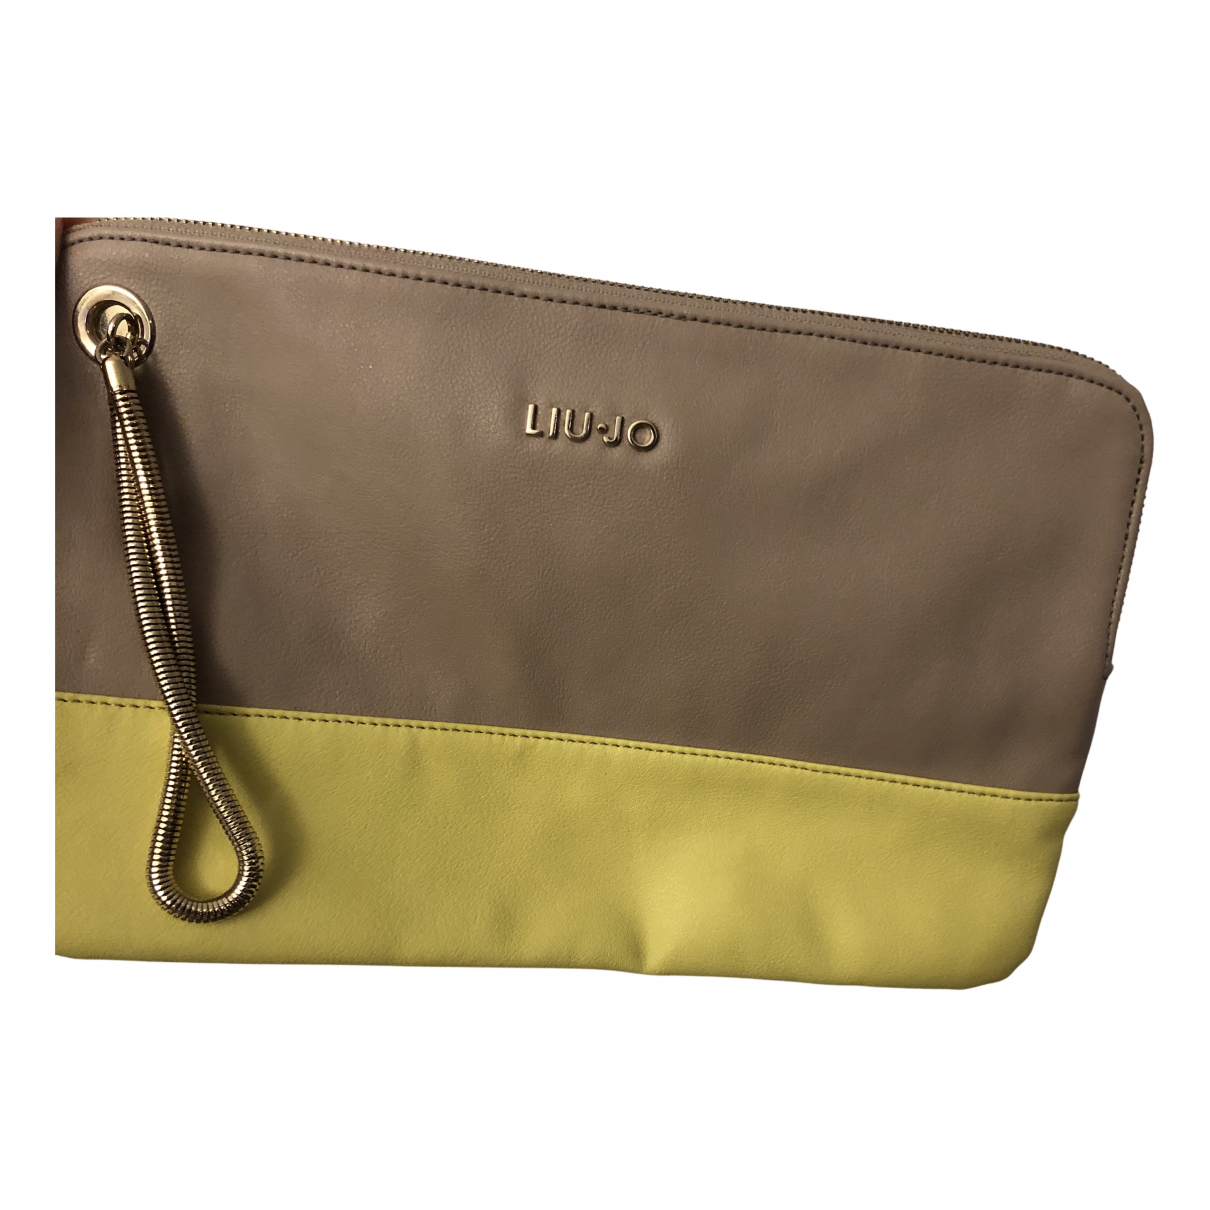 Liu.jo N Beige Leather Clutch bag for Women N